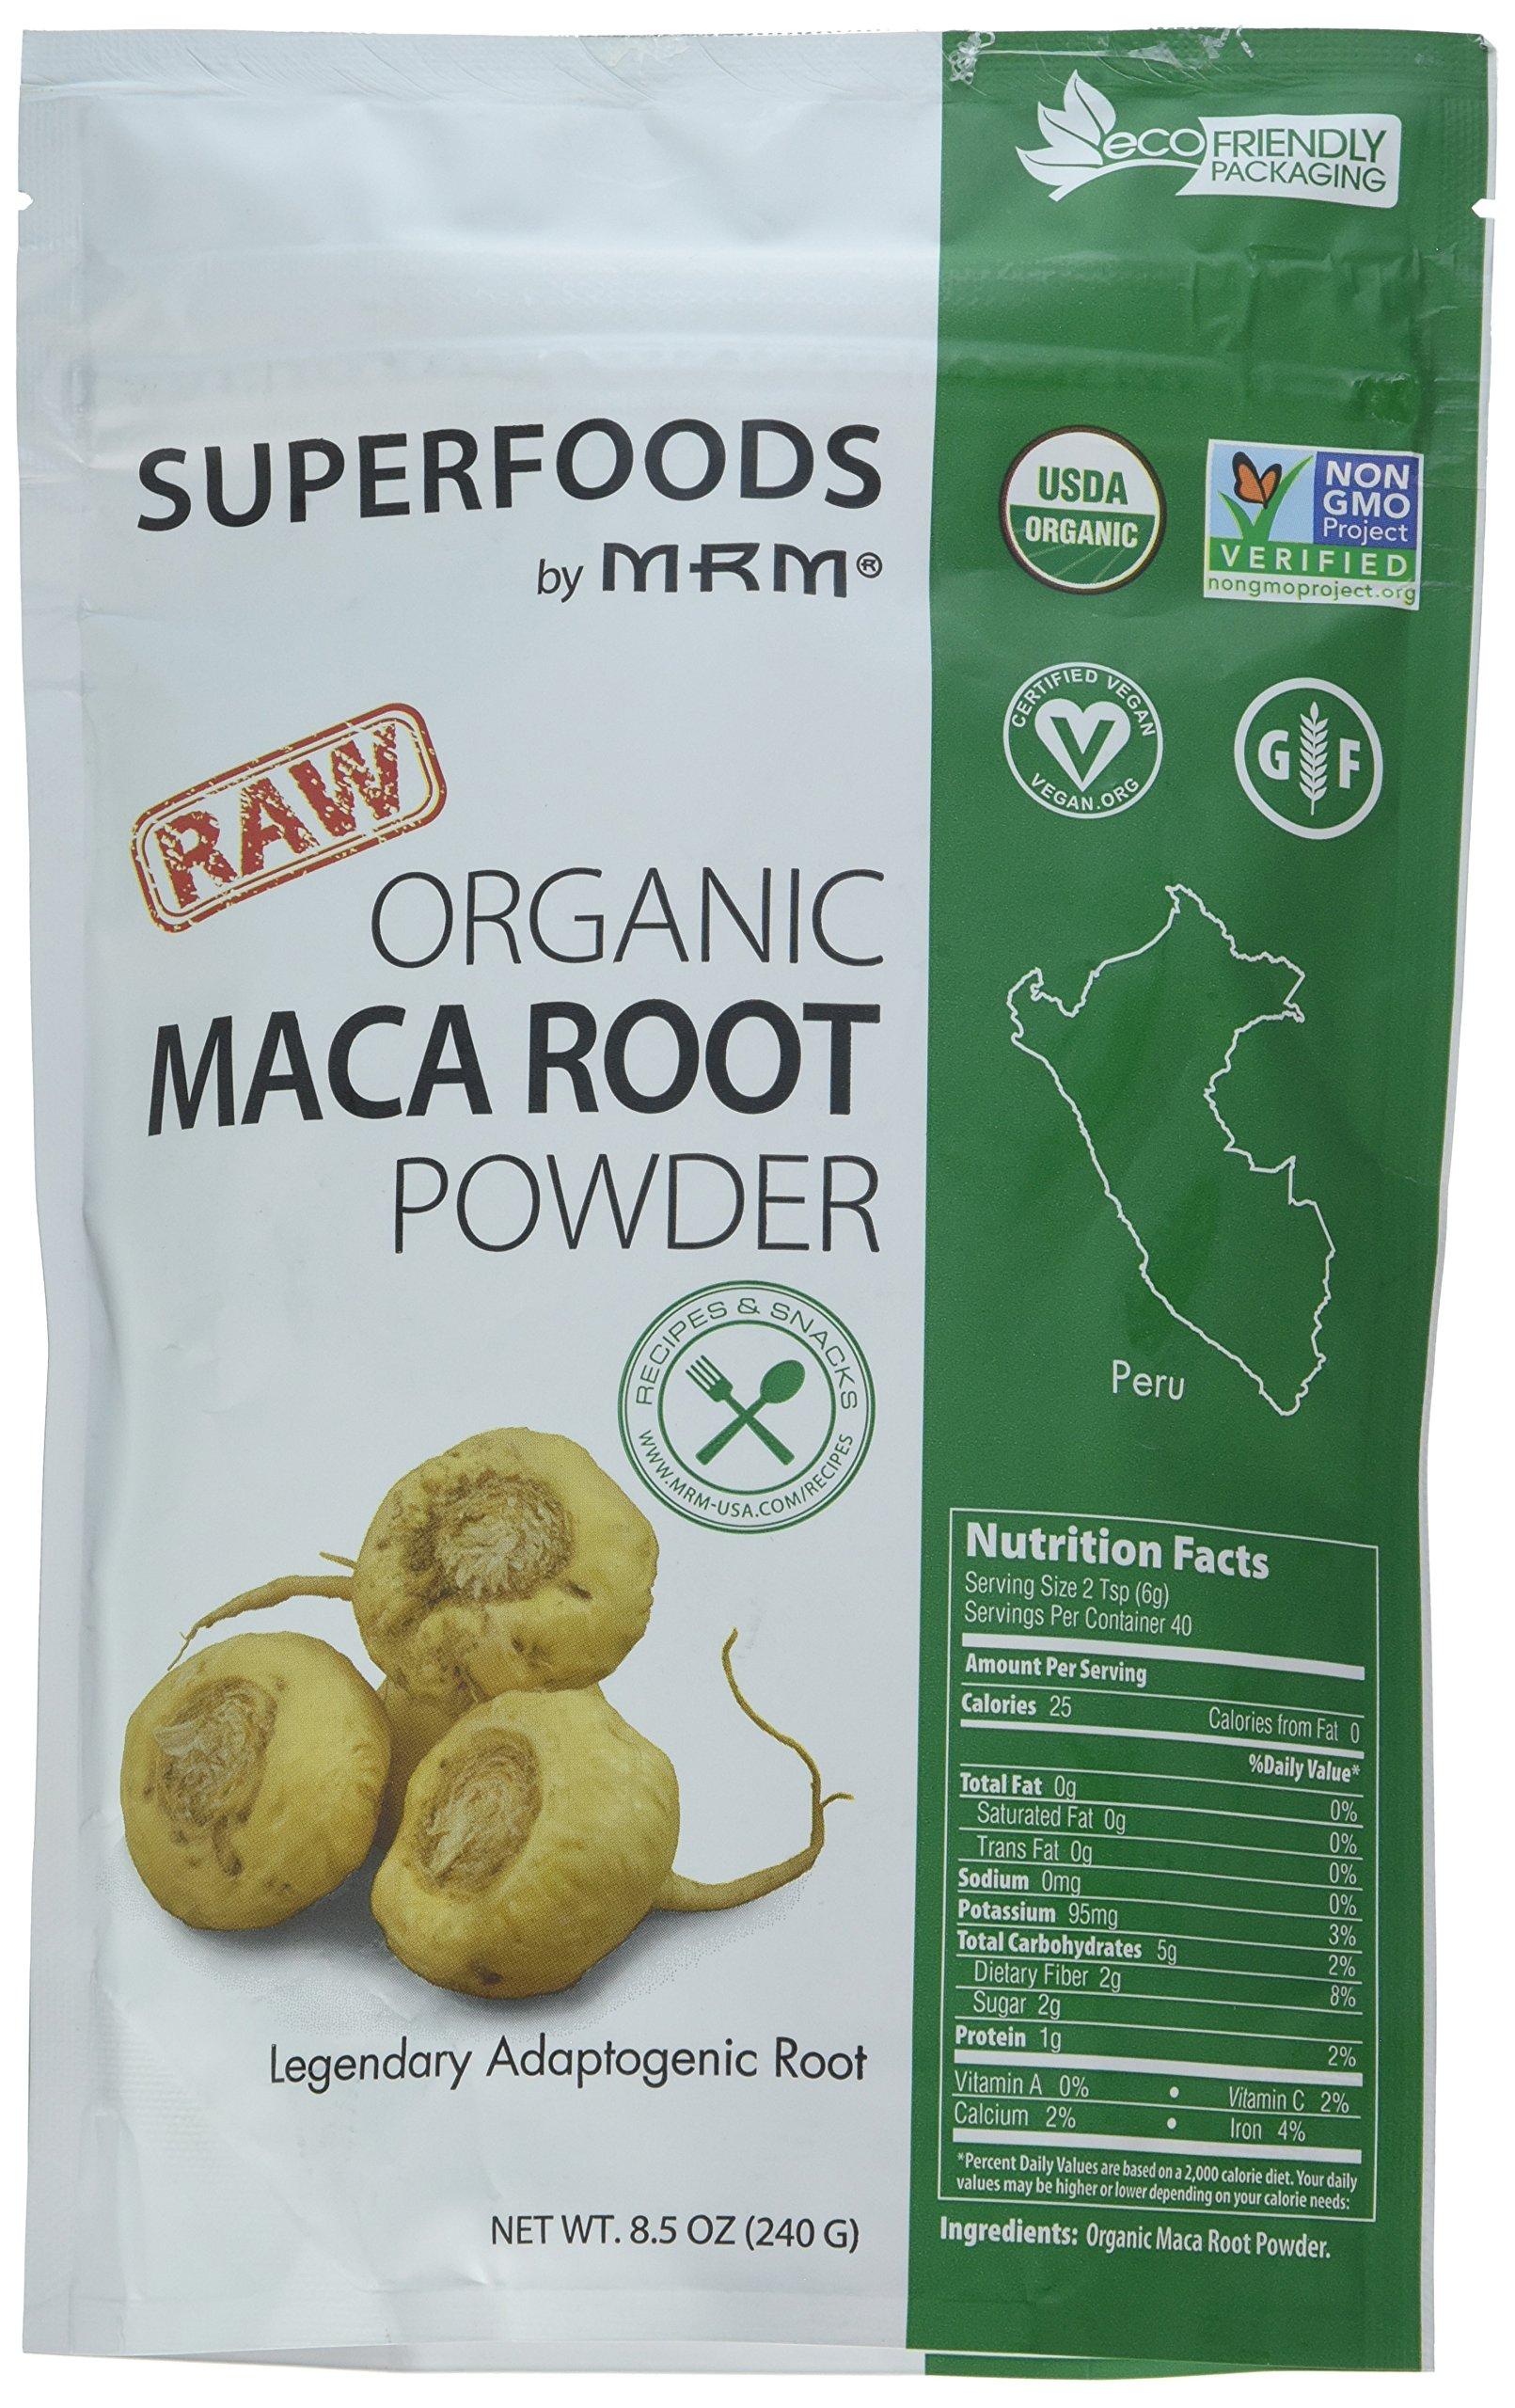 MRM - Maca Root Raw Superfood, Organic, Non-GMO Project Verified, Vegan and Gluten-Free (8.5 oz)